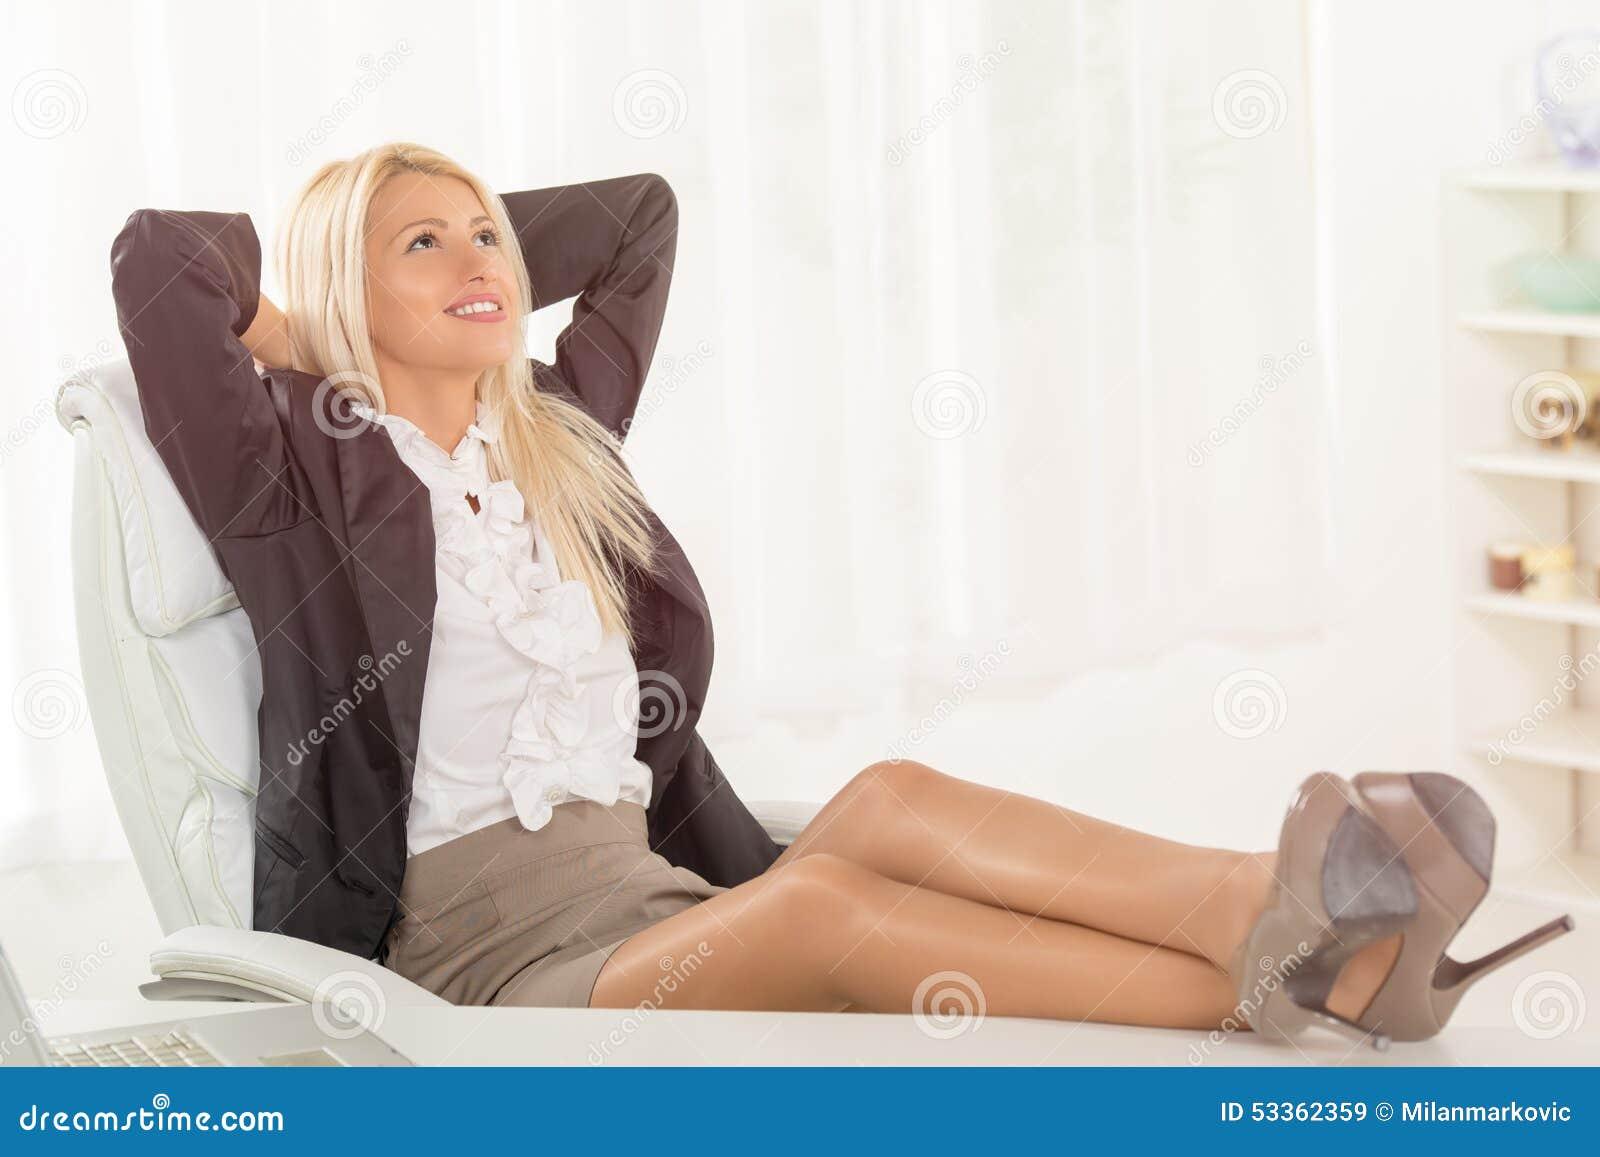 Successful Businesswoman Stock Photo Image 53362359